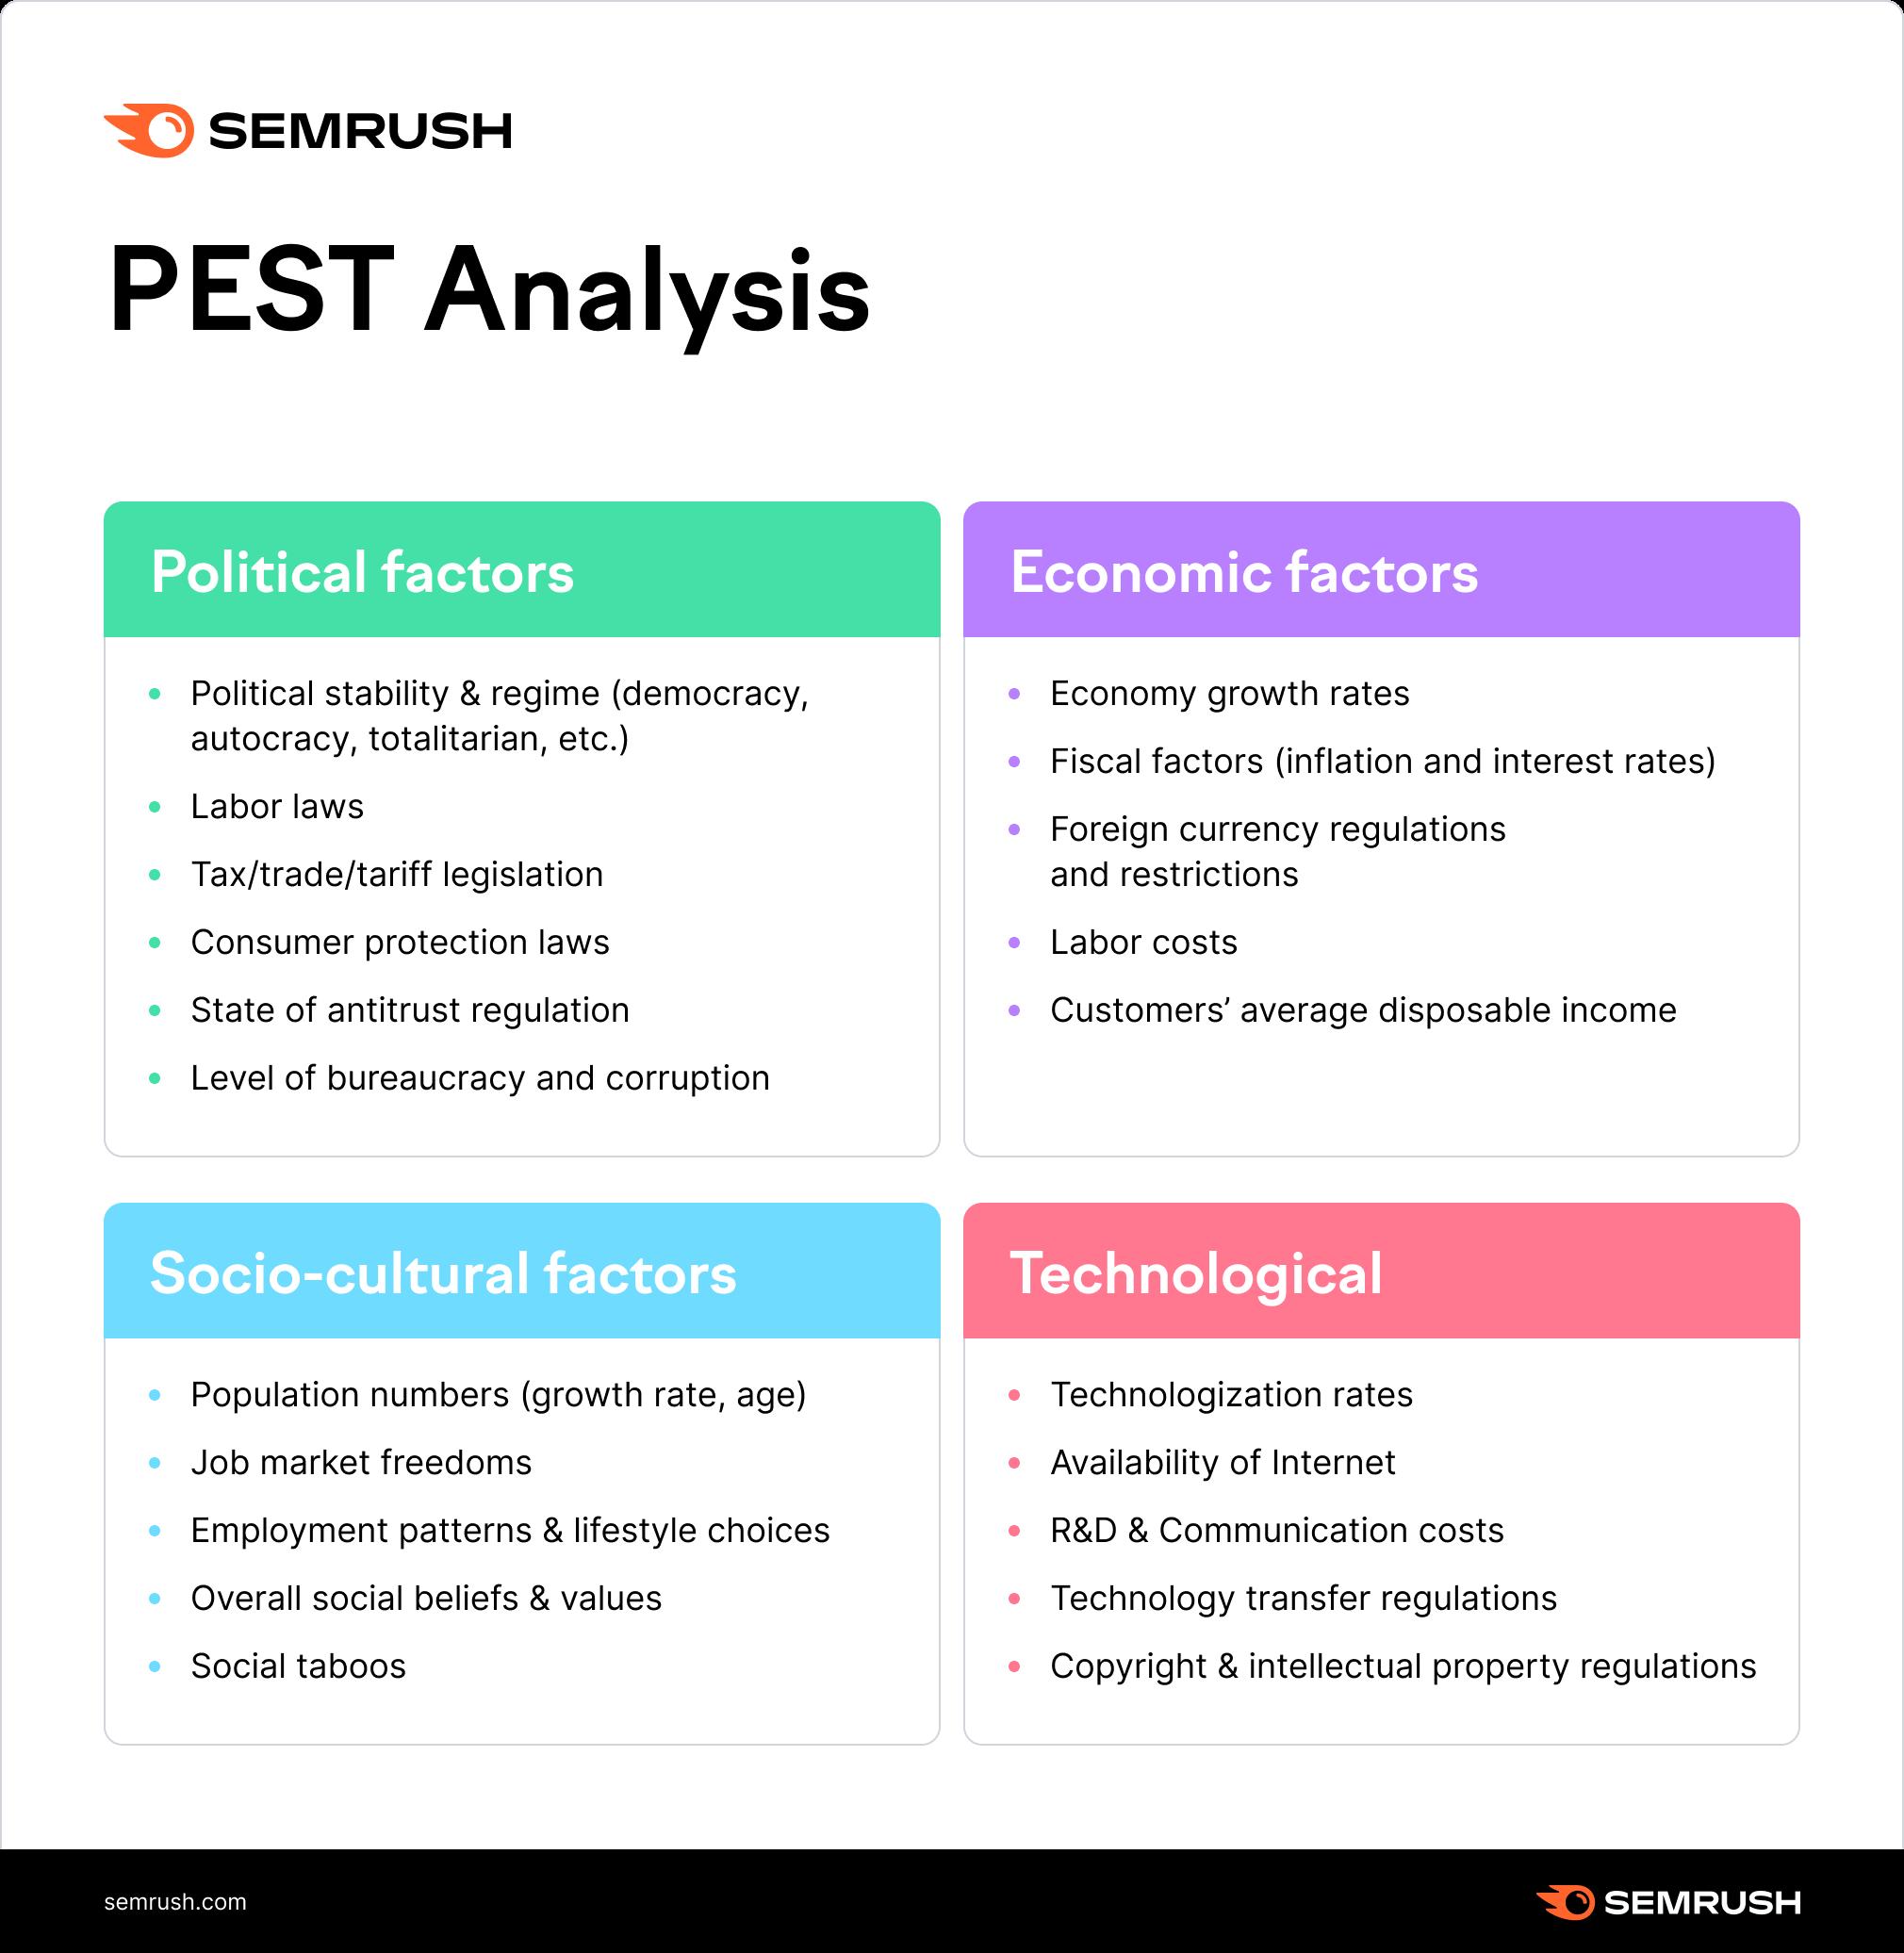 PEST analysis factors